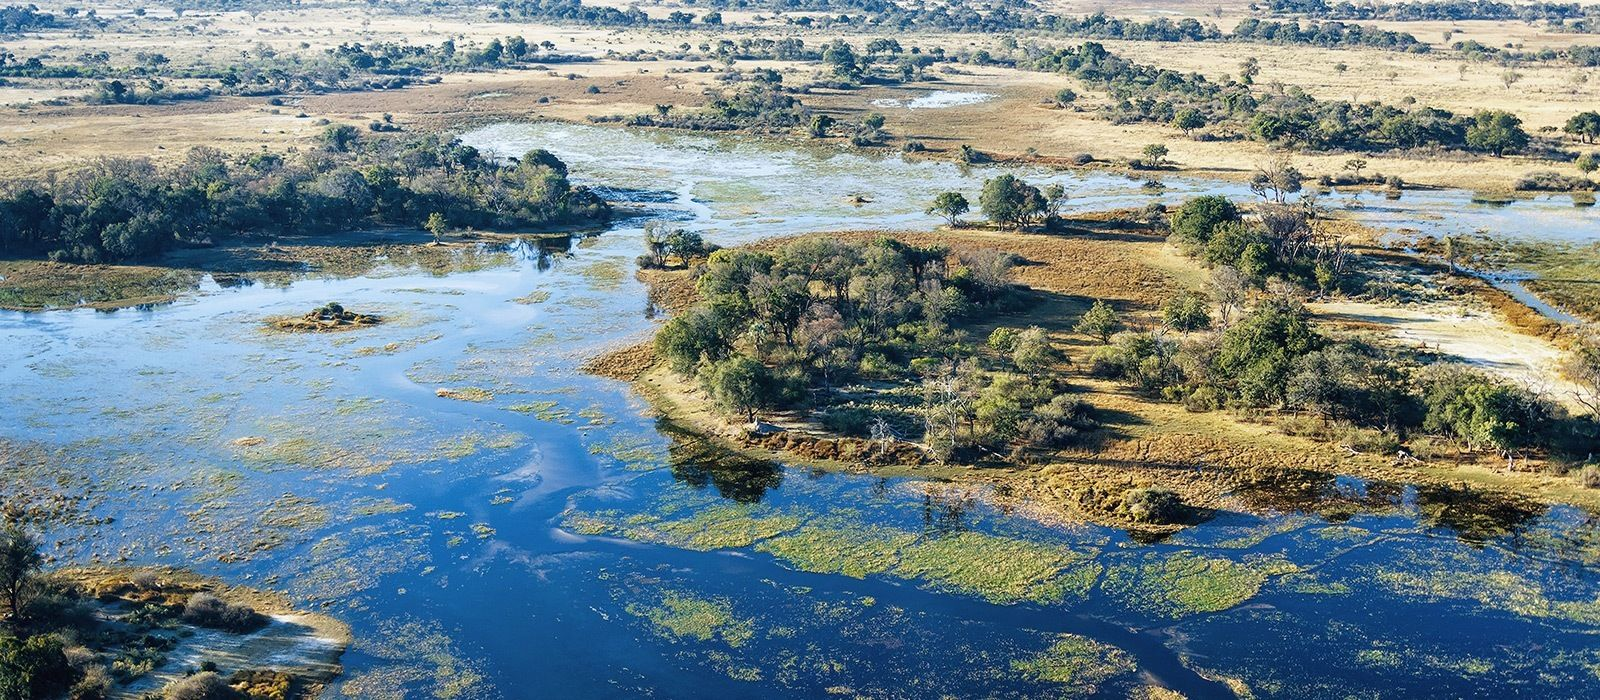 Classic Namibia and Botswana Overland Tour Trip 8